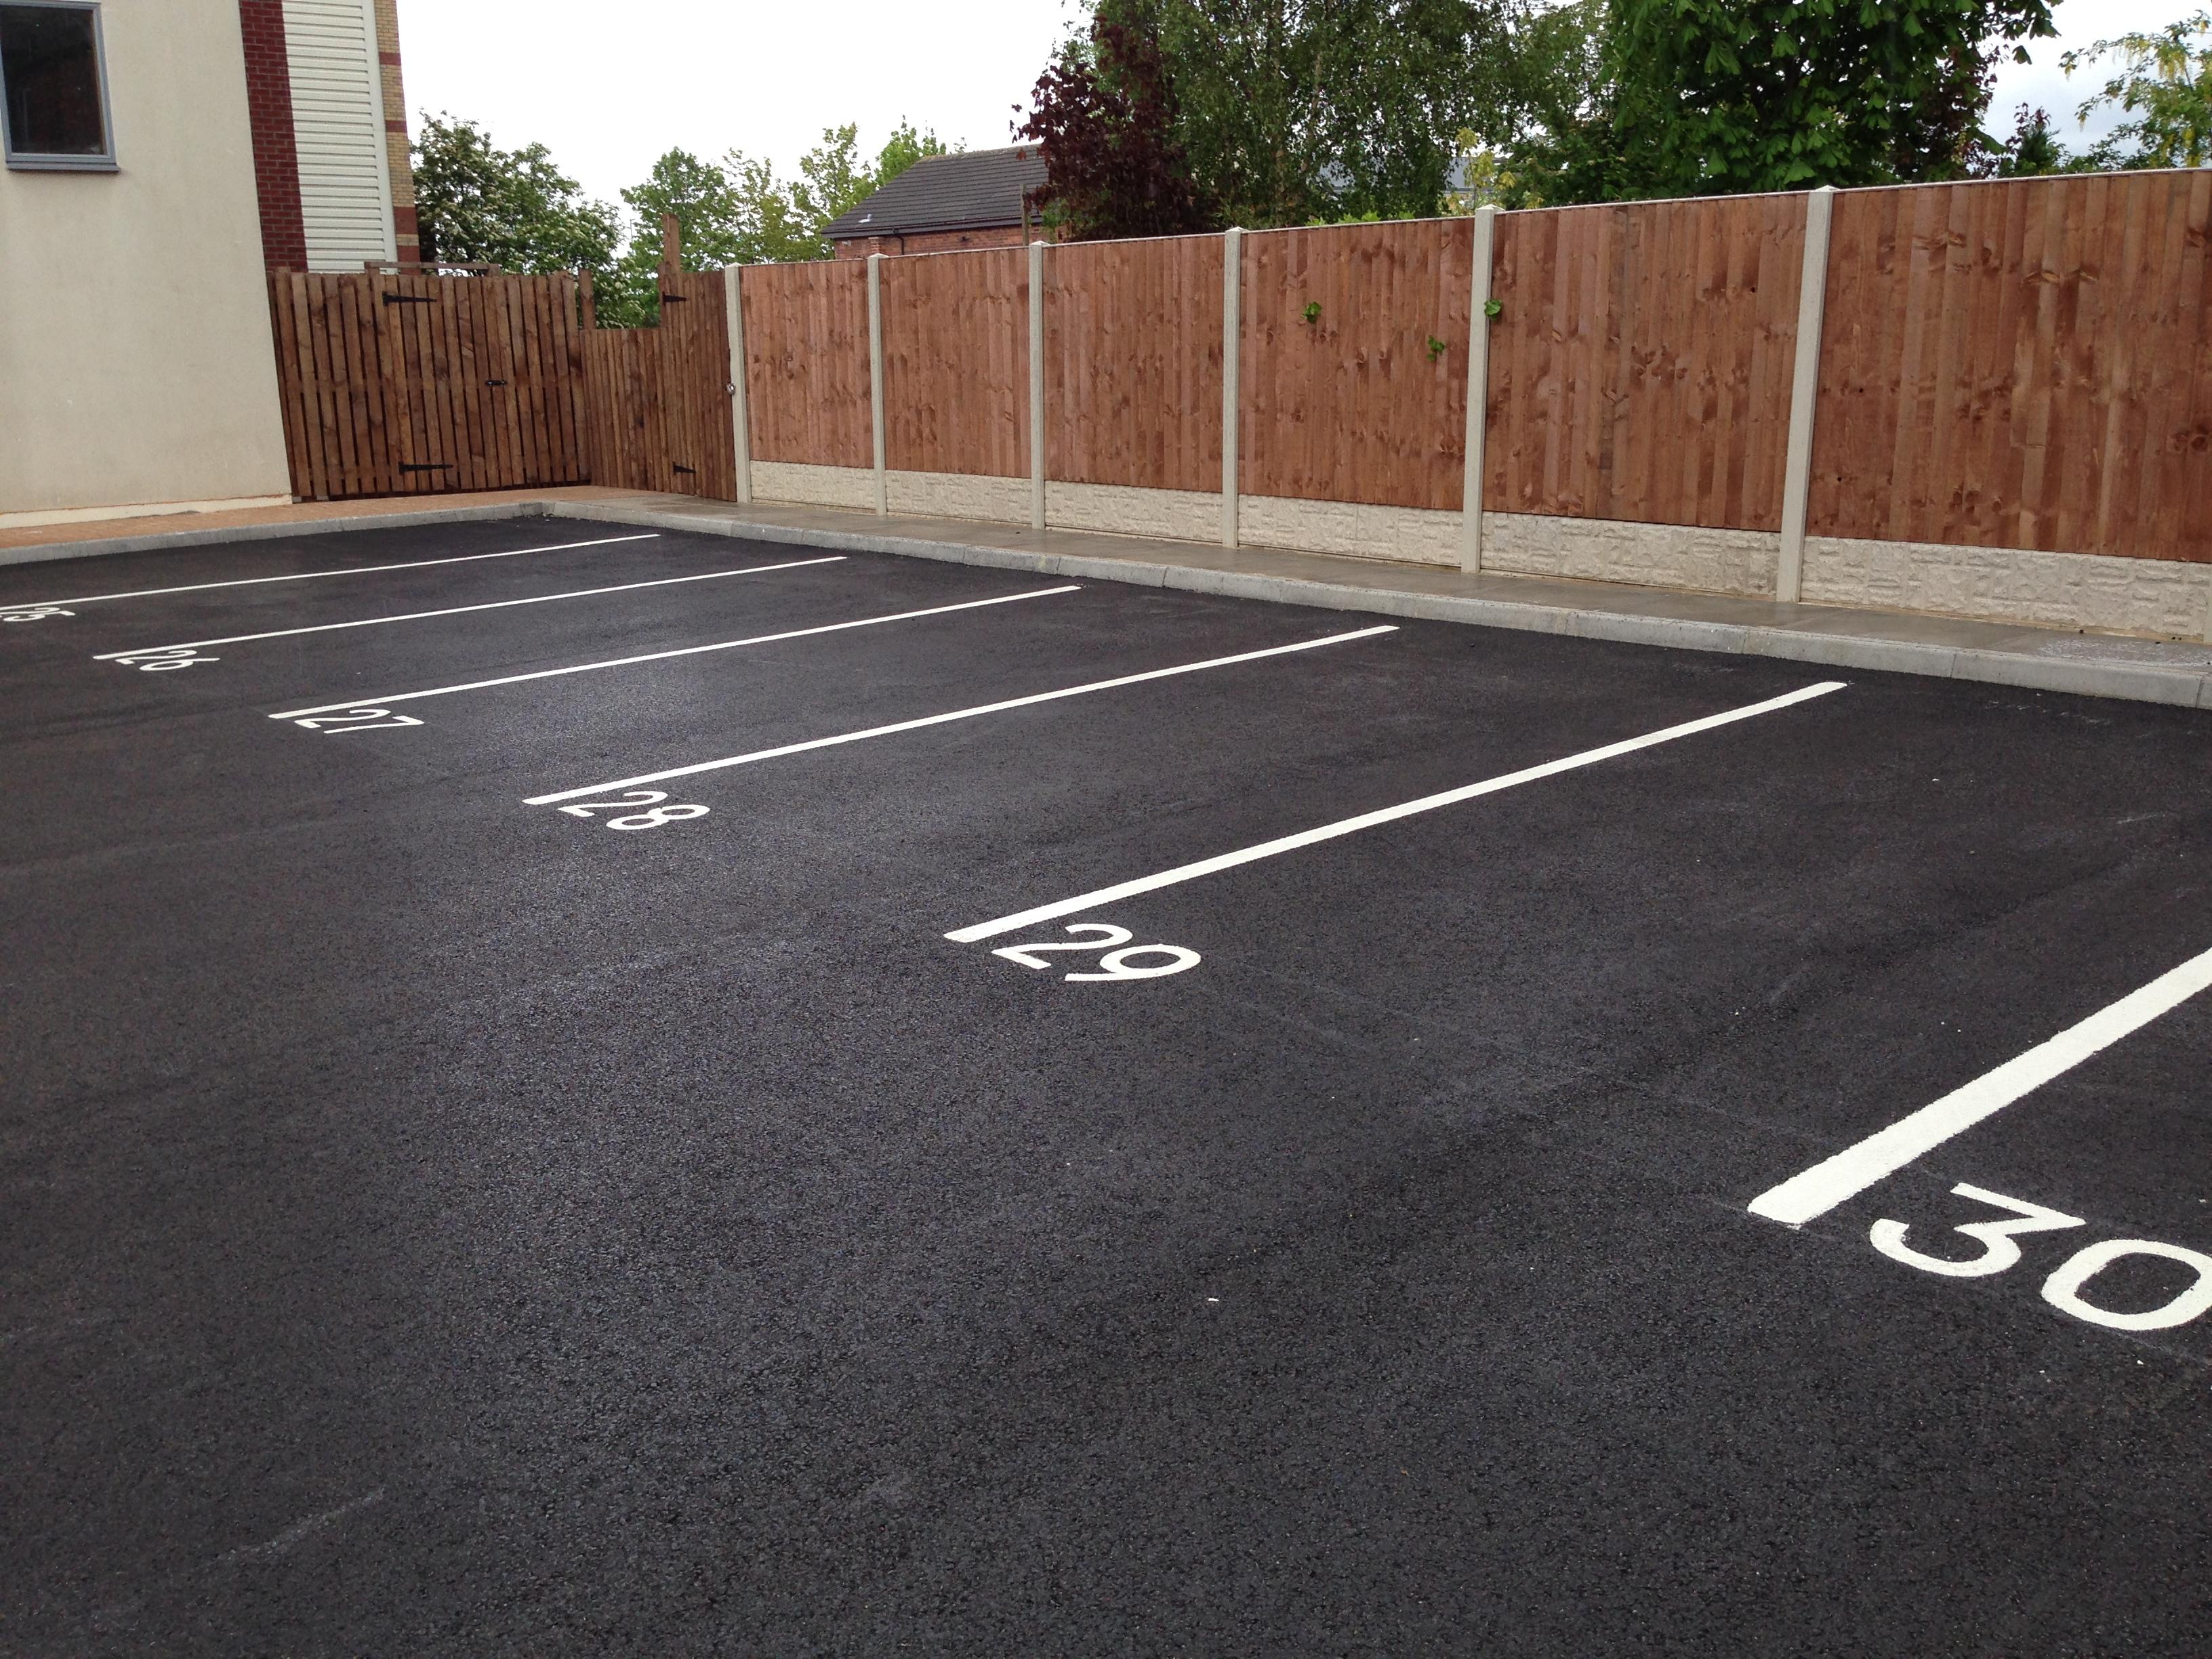 How To Line Mark A Car Park